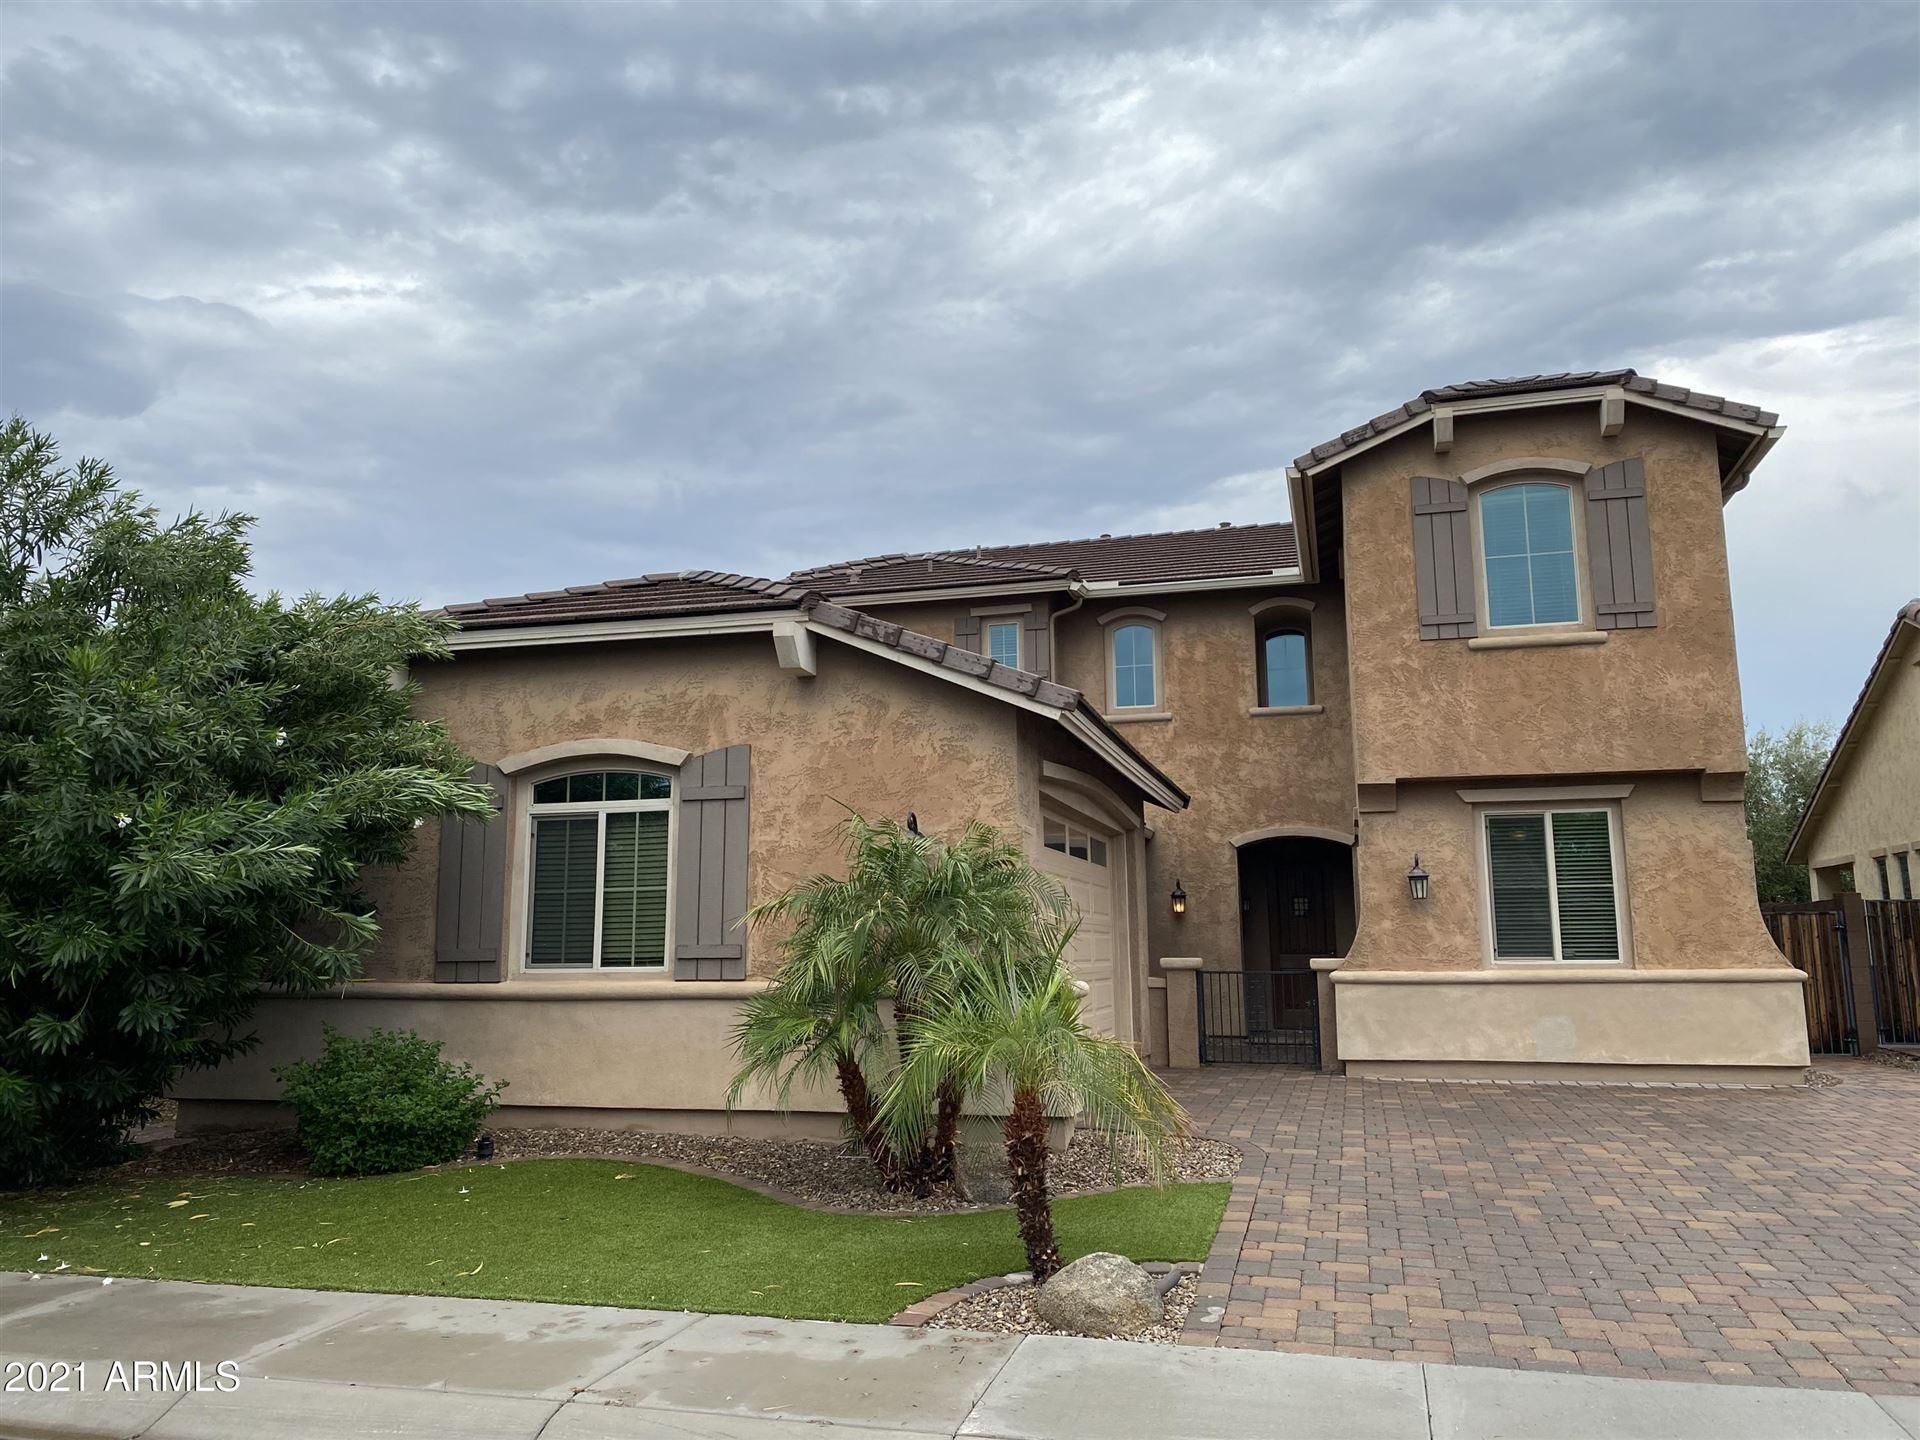 Photo of 4320 S JASMINE Drive, Chandler, AZ 85249 (MLS # 6269352)